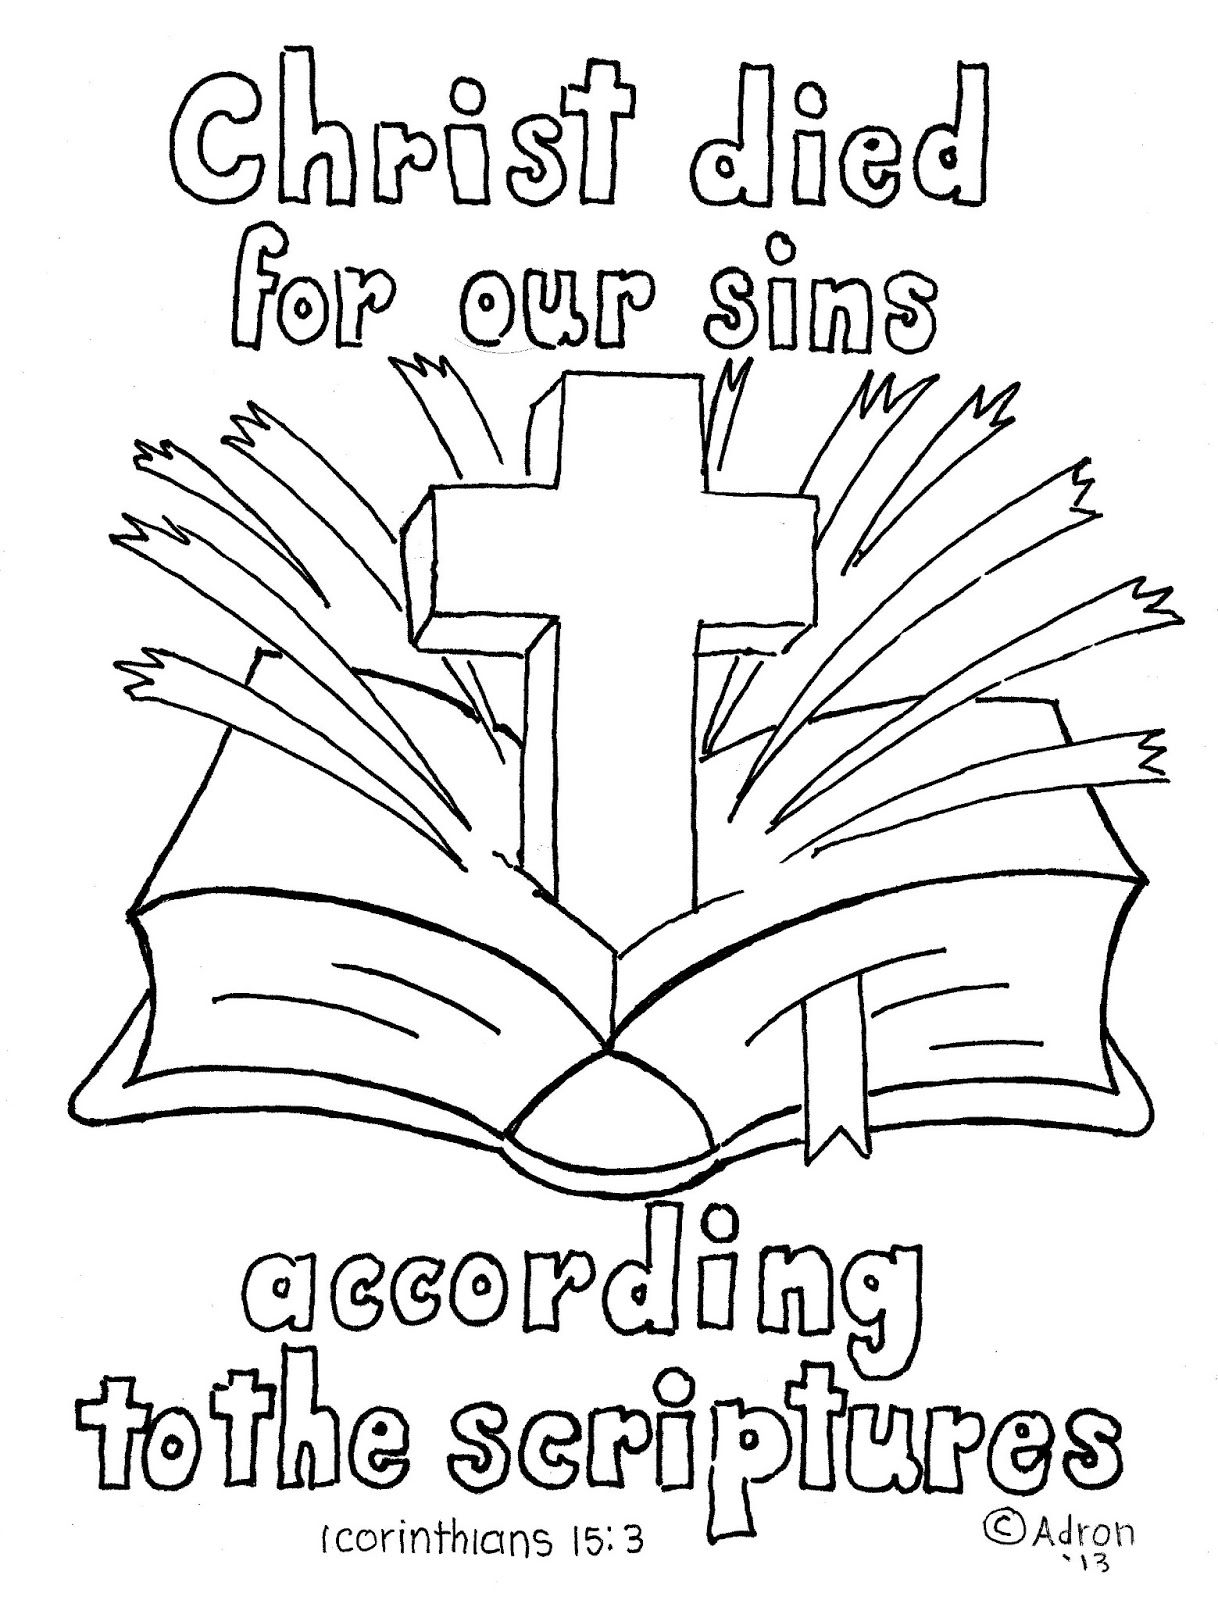 1 Corinthians 15 3 4 Bible Verse Print And Color Page 1 Cor 15